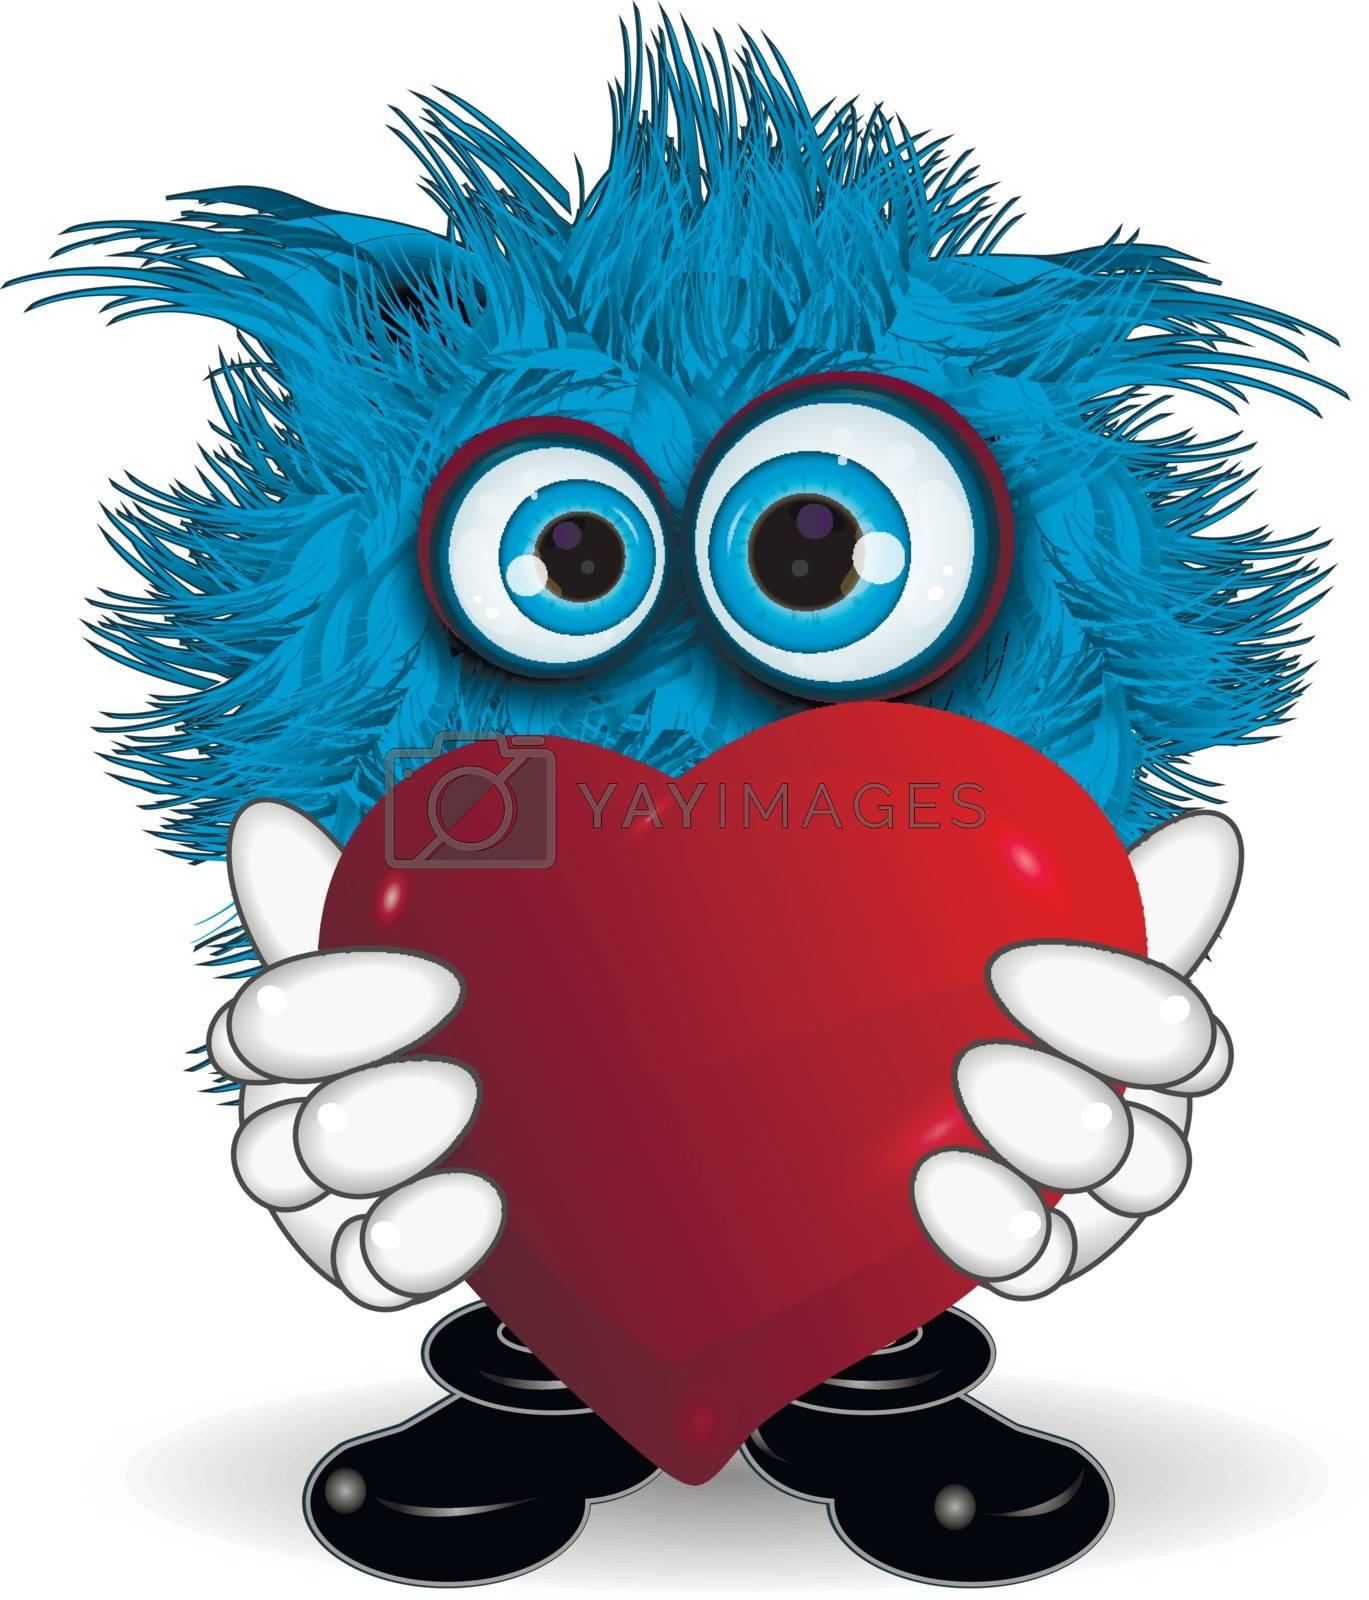 Blue Monster Keeps Heart by brux